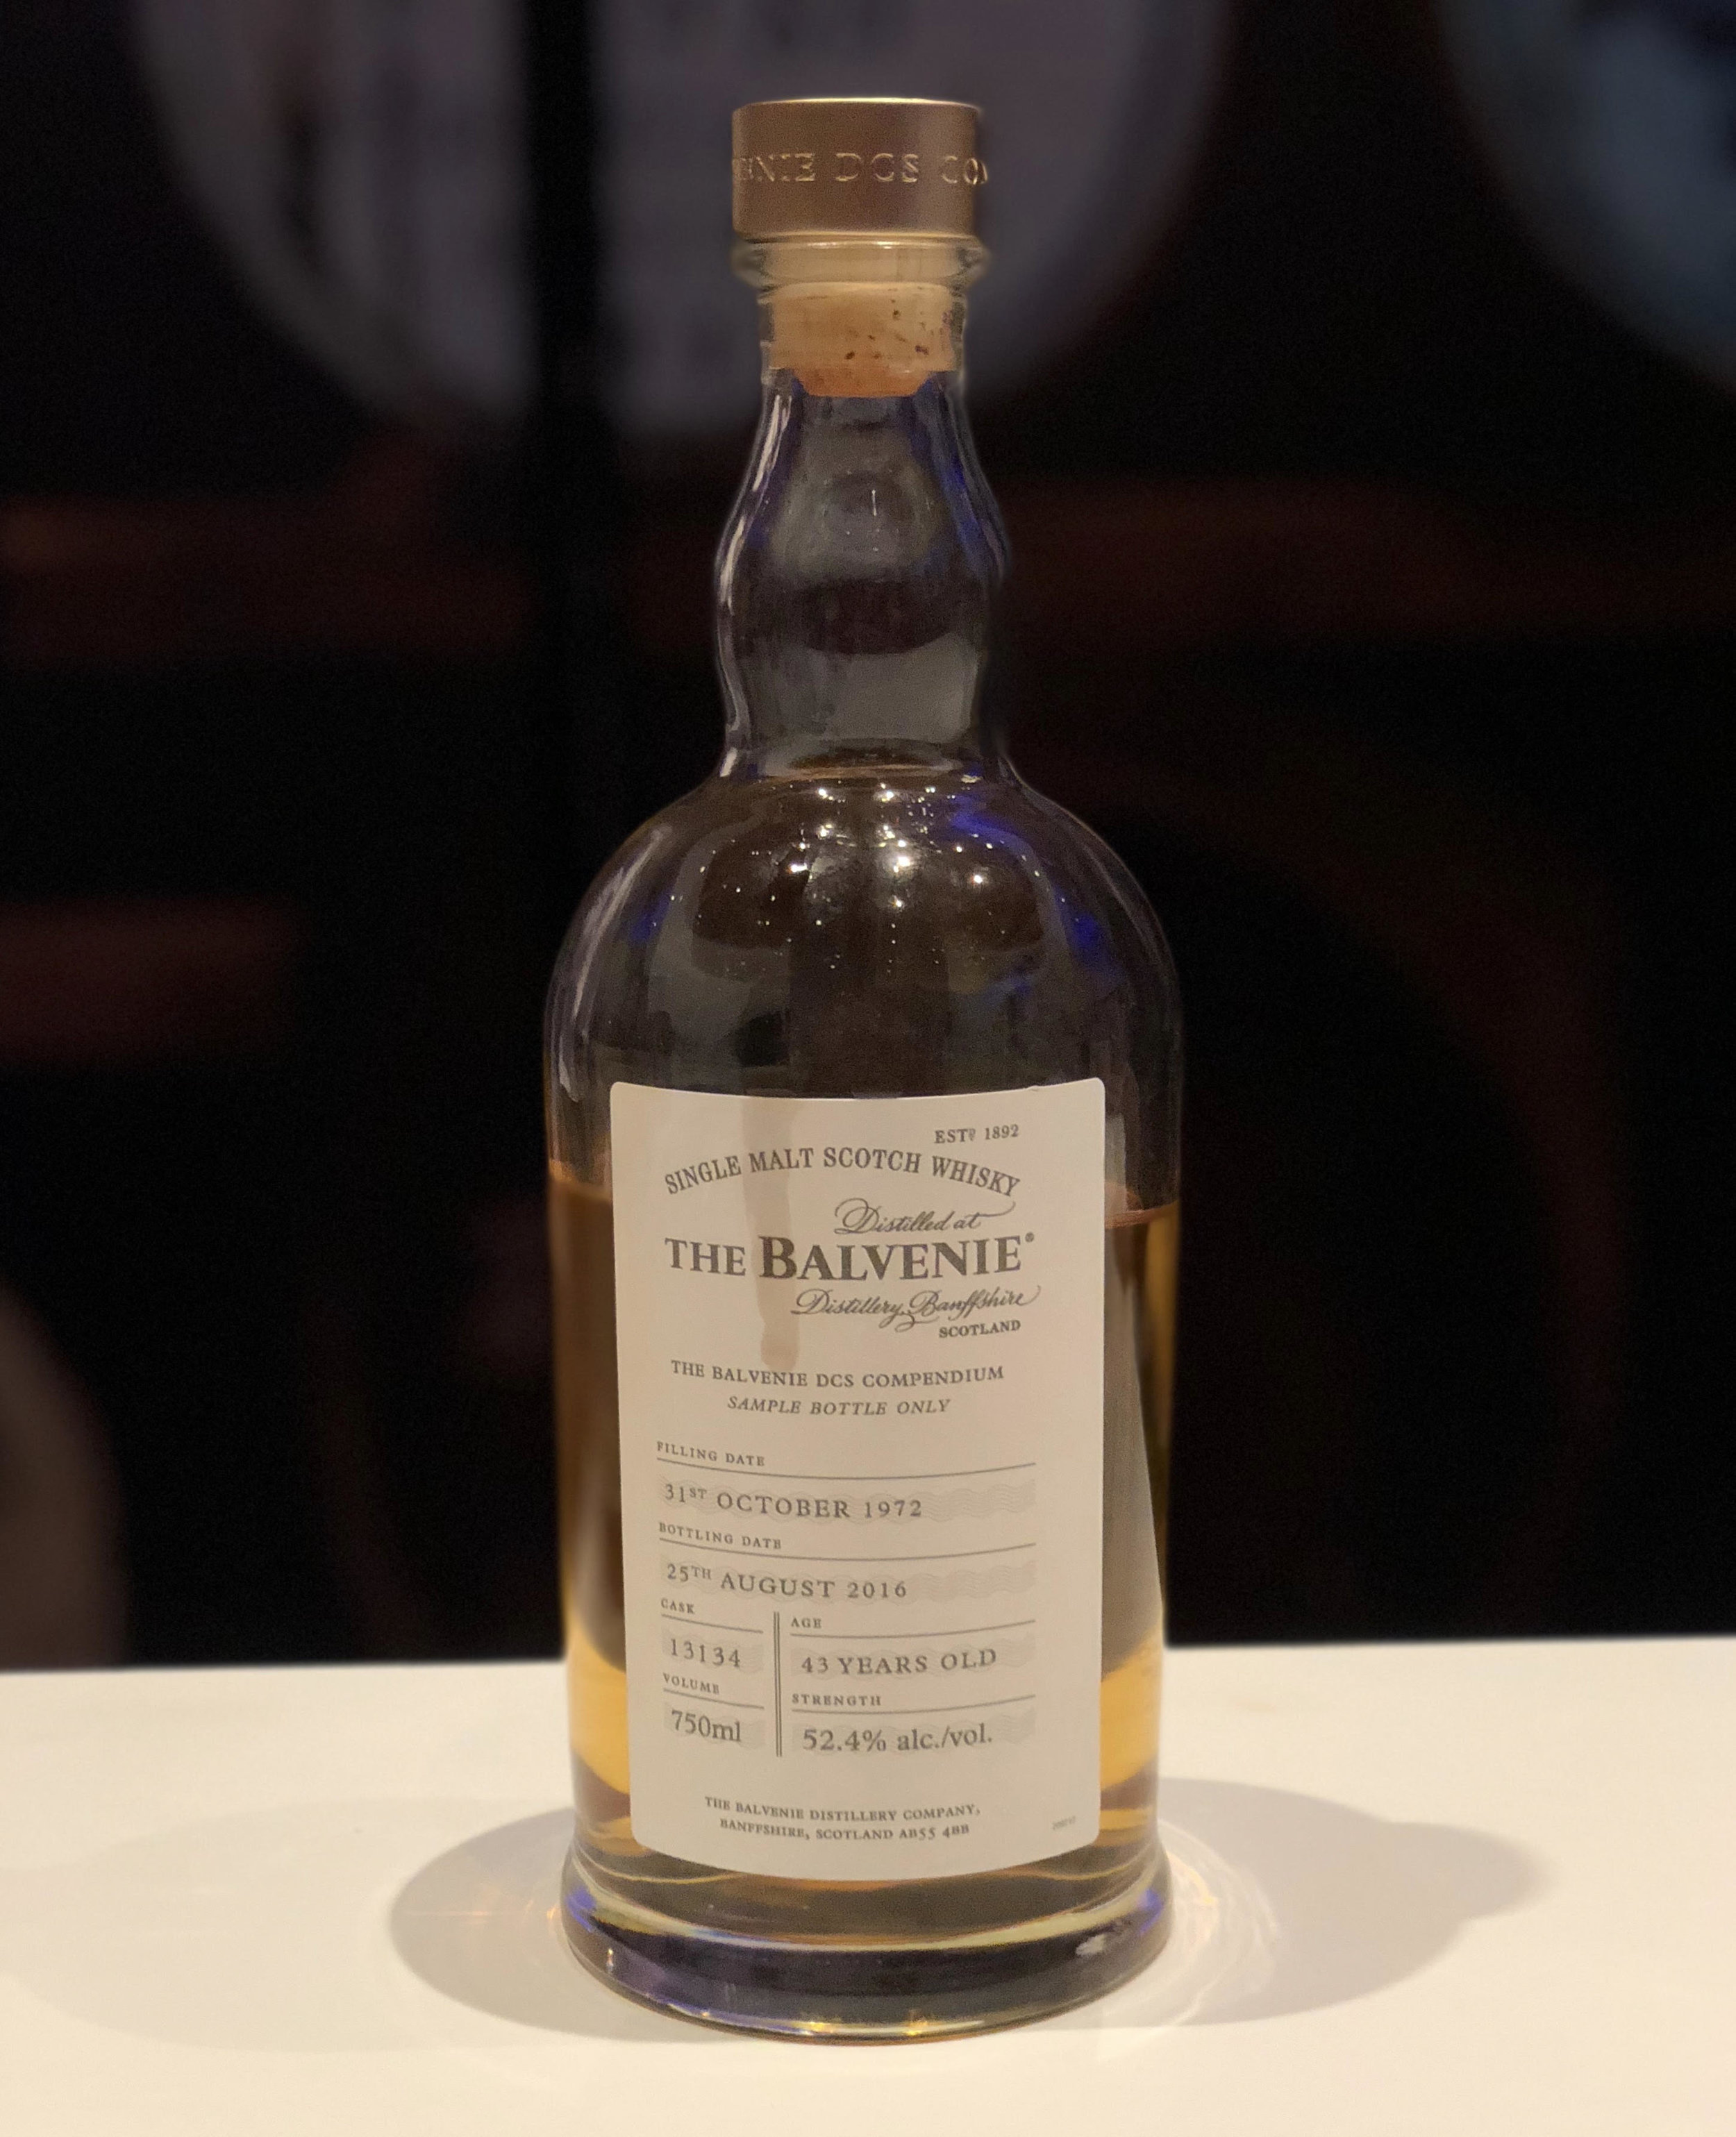 Balvenie DCS Compendium Chapter 2 - 1972